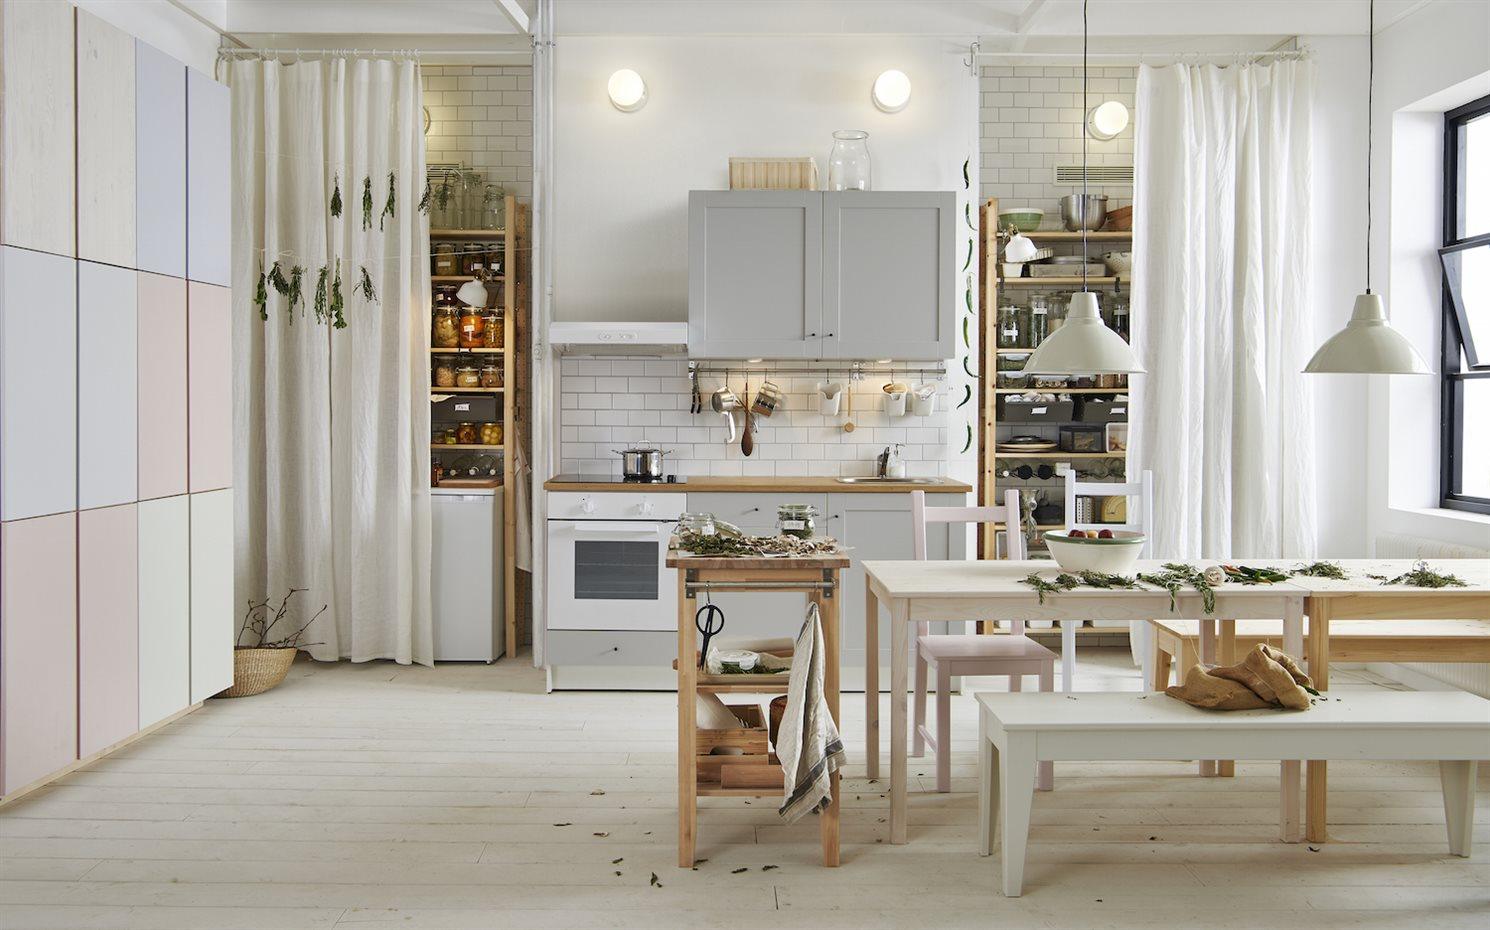 cocina knoxhultk con armario con puertas o cajones fregadero fyndig sifn lillviken